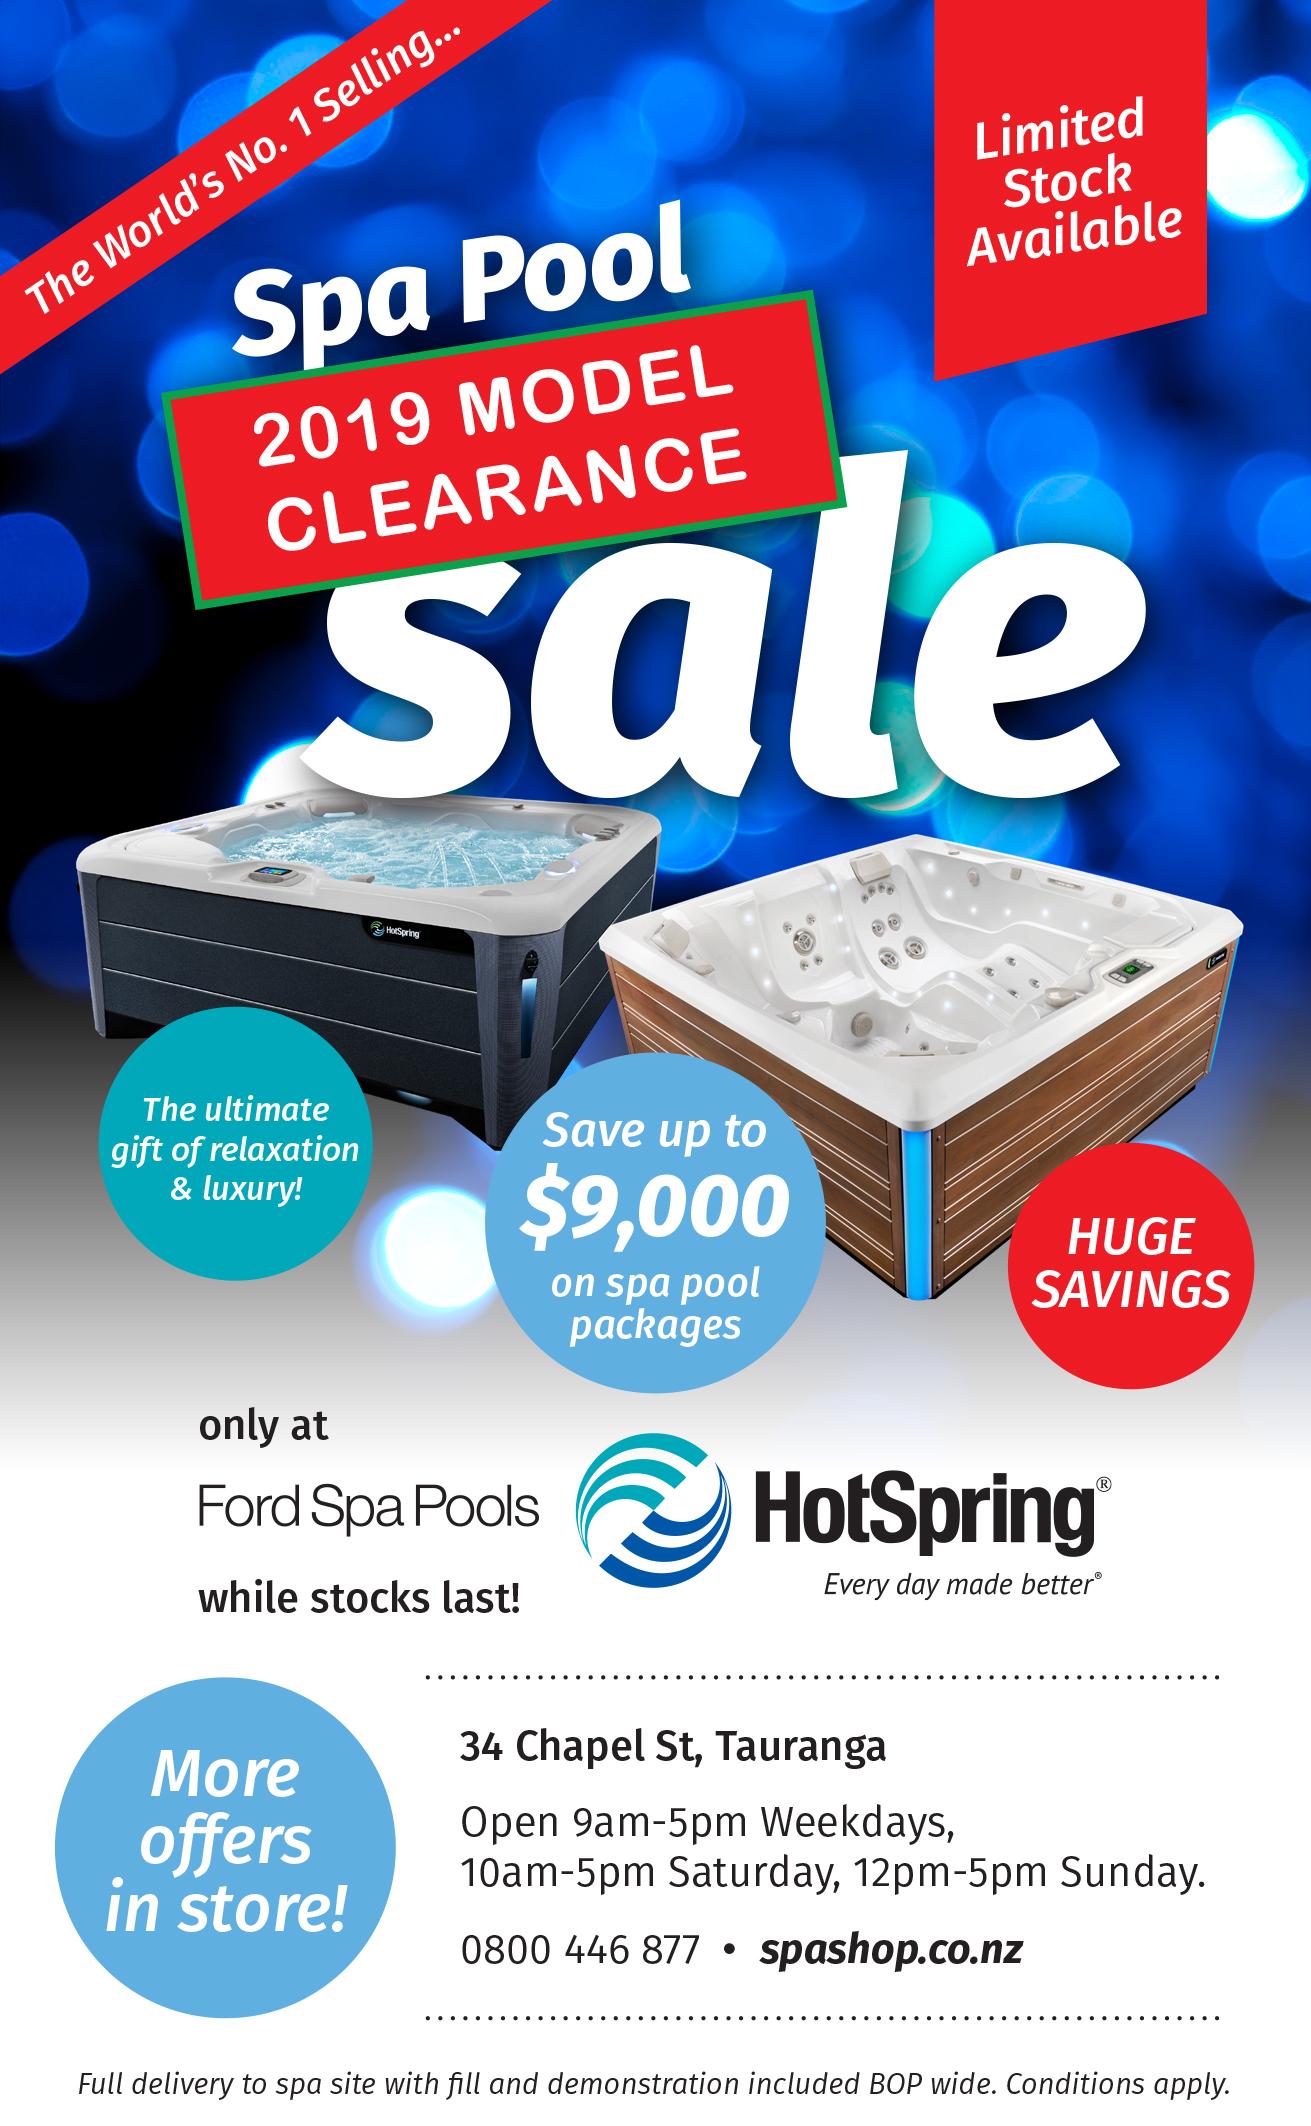 hot-spring-spa-sale-hamilton.jpg